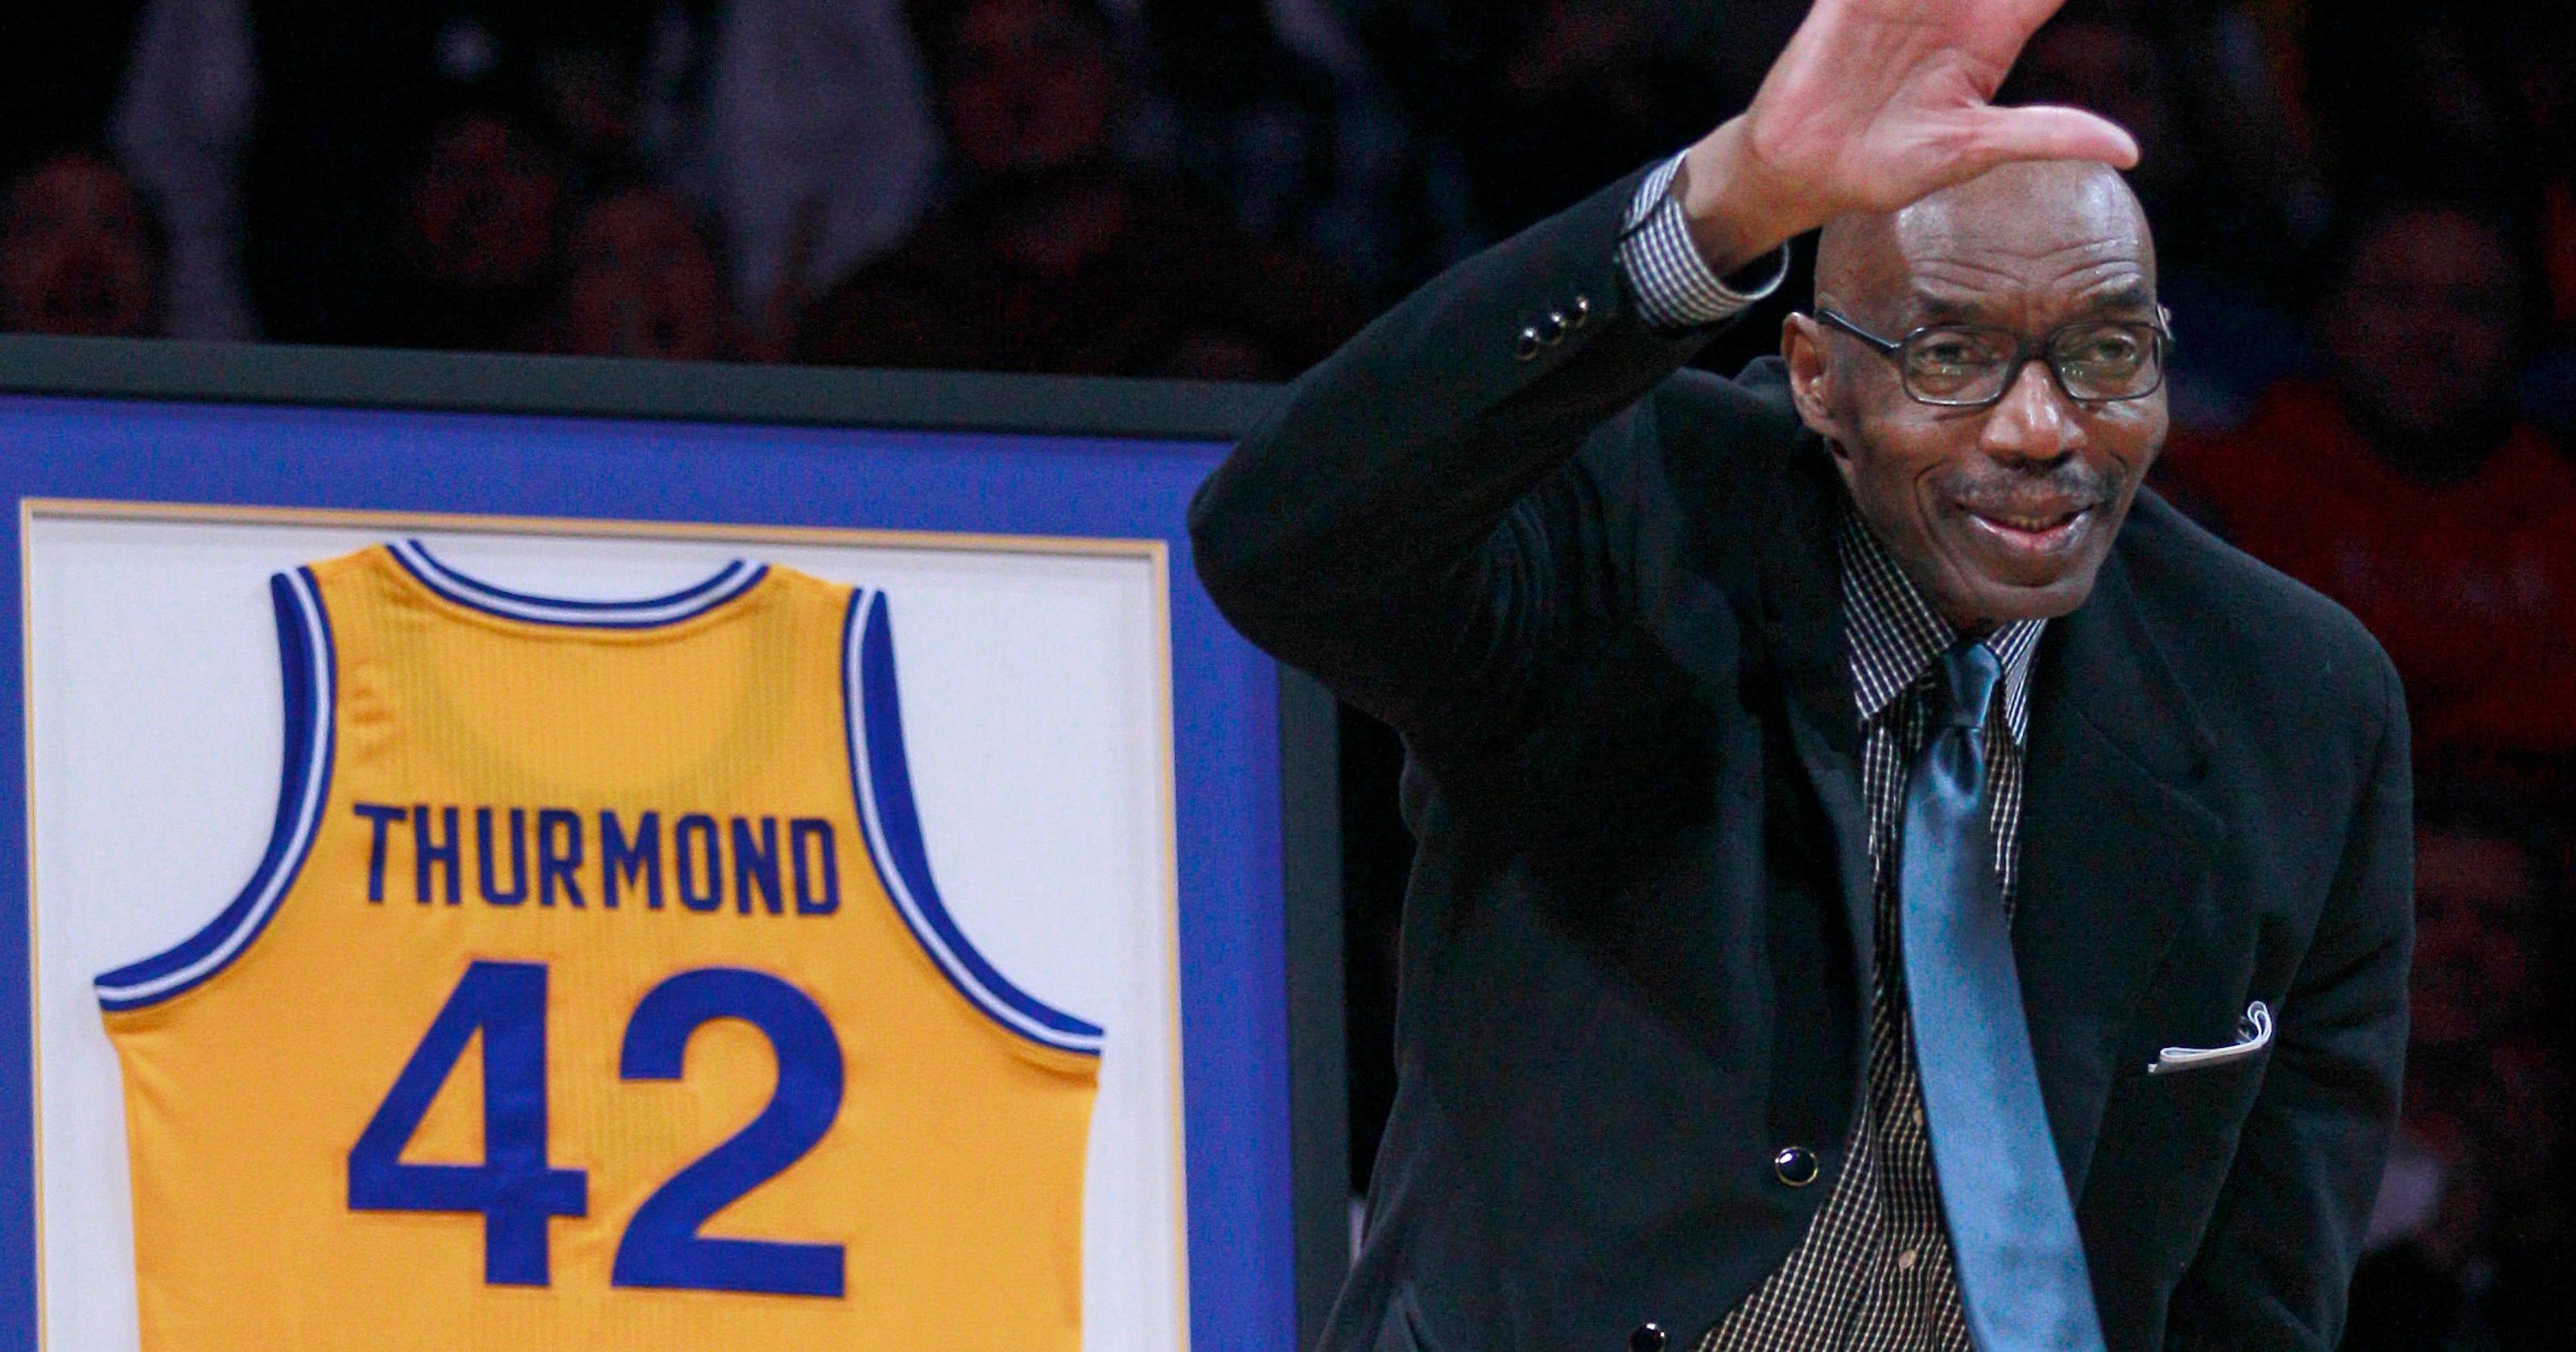 730c62453ba0 Warriors great Nate Thurmond dies at 74